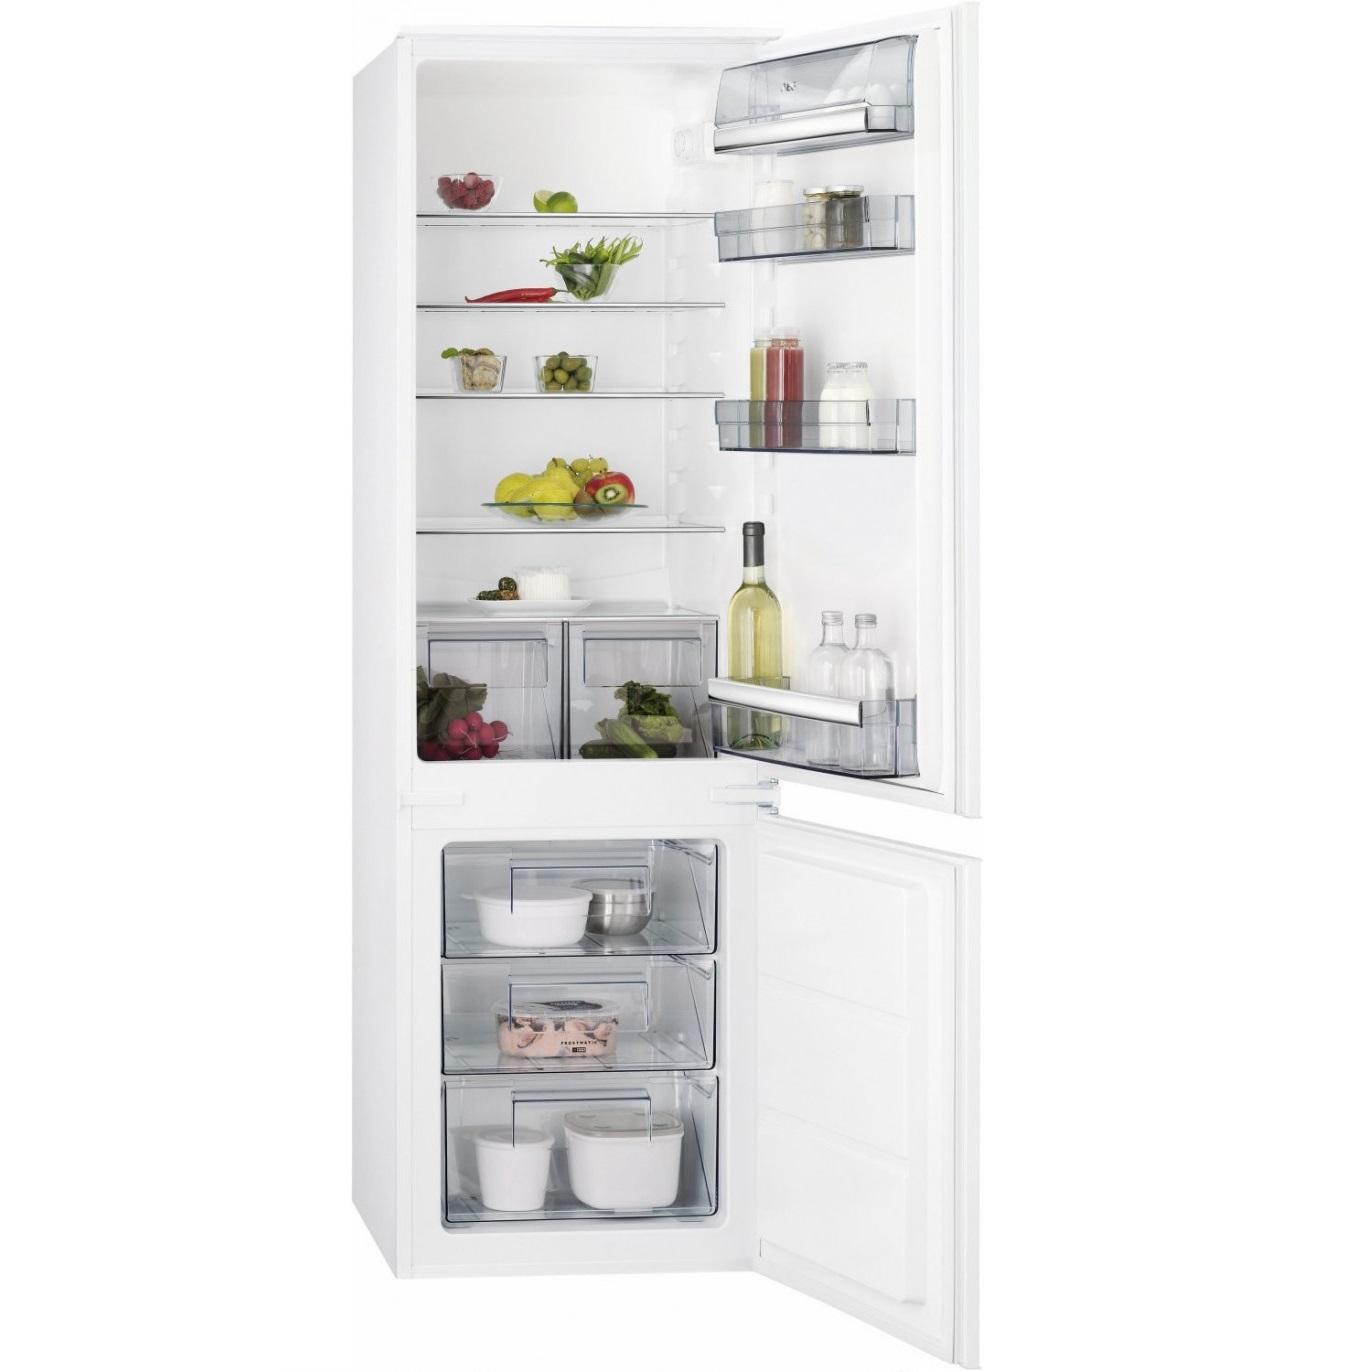 AEG kombinovani ugradni frižider SCB61821LS - Inelektronik